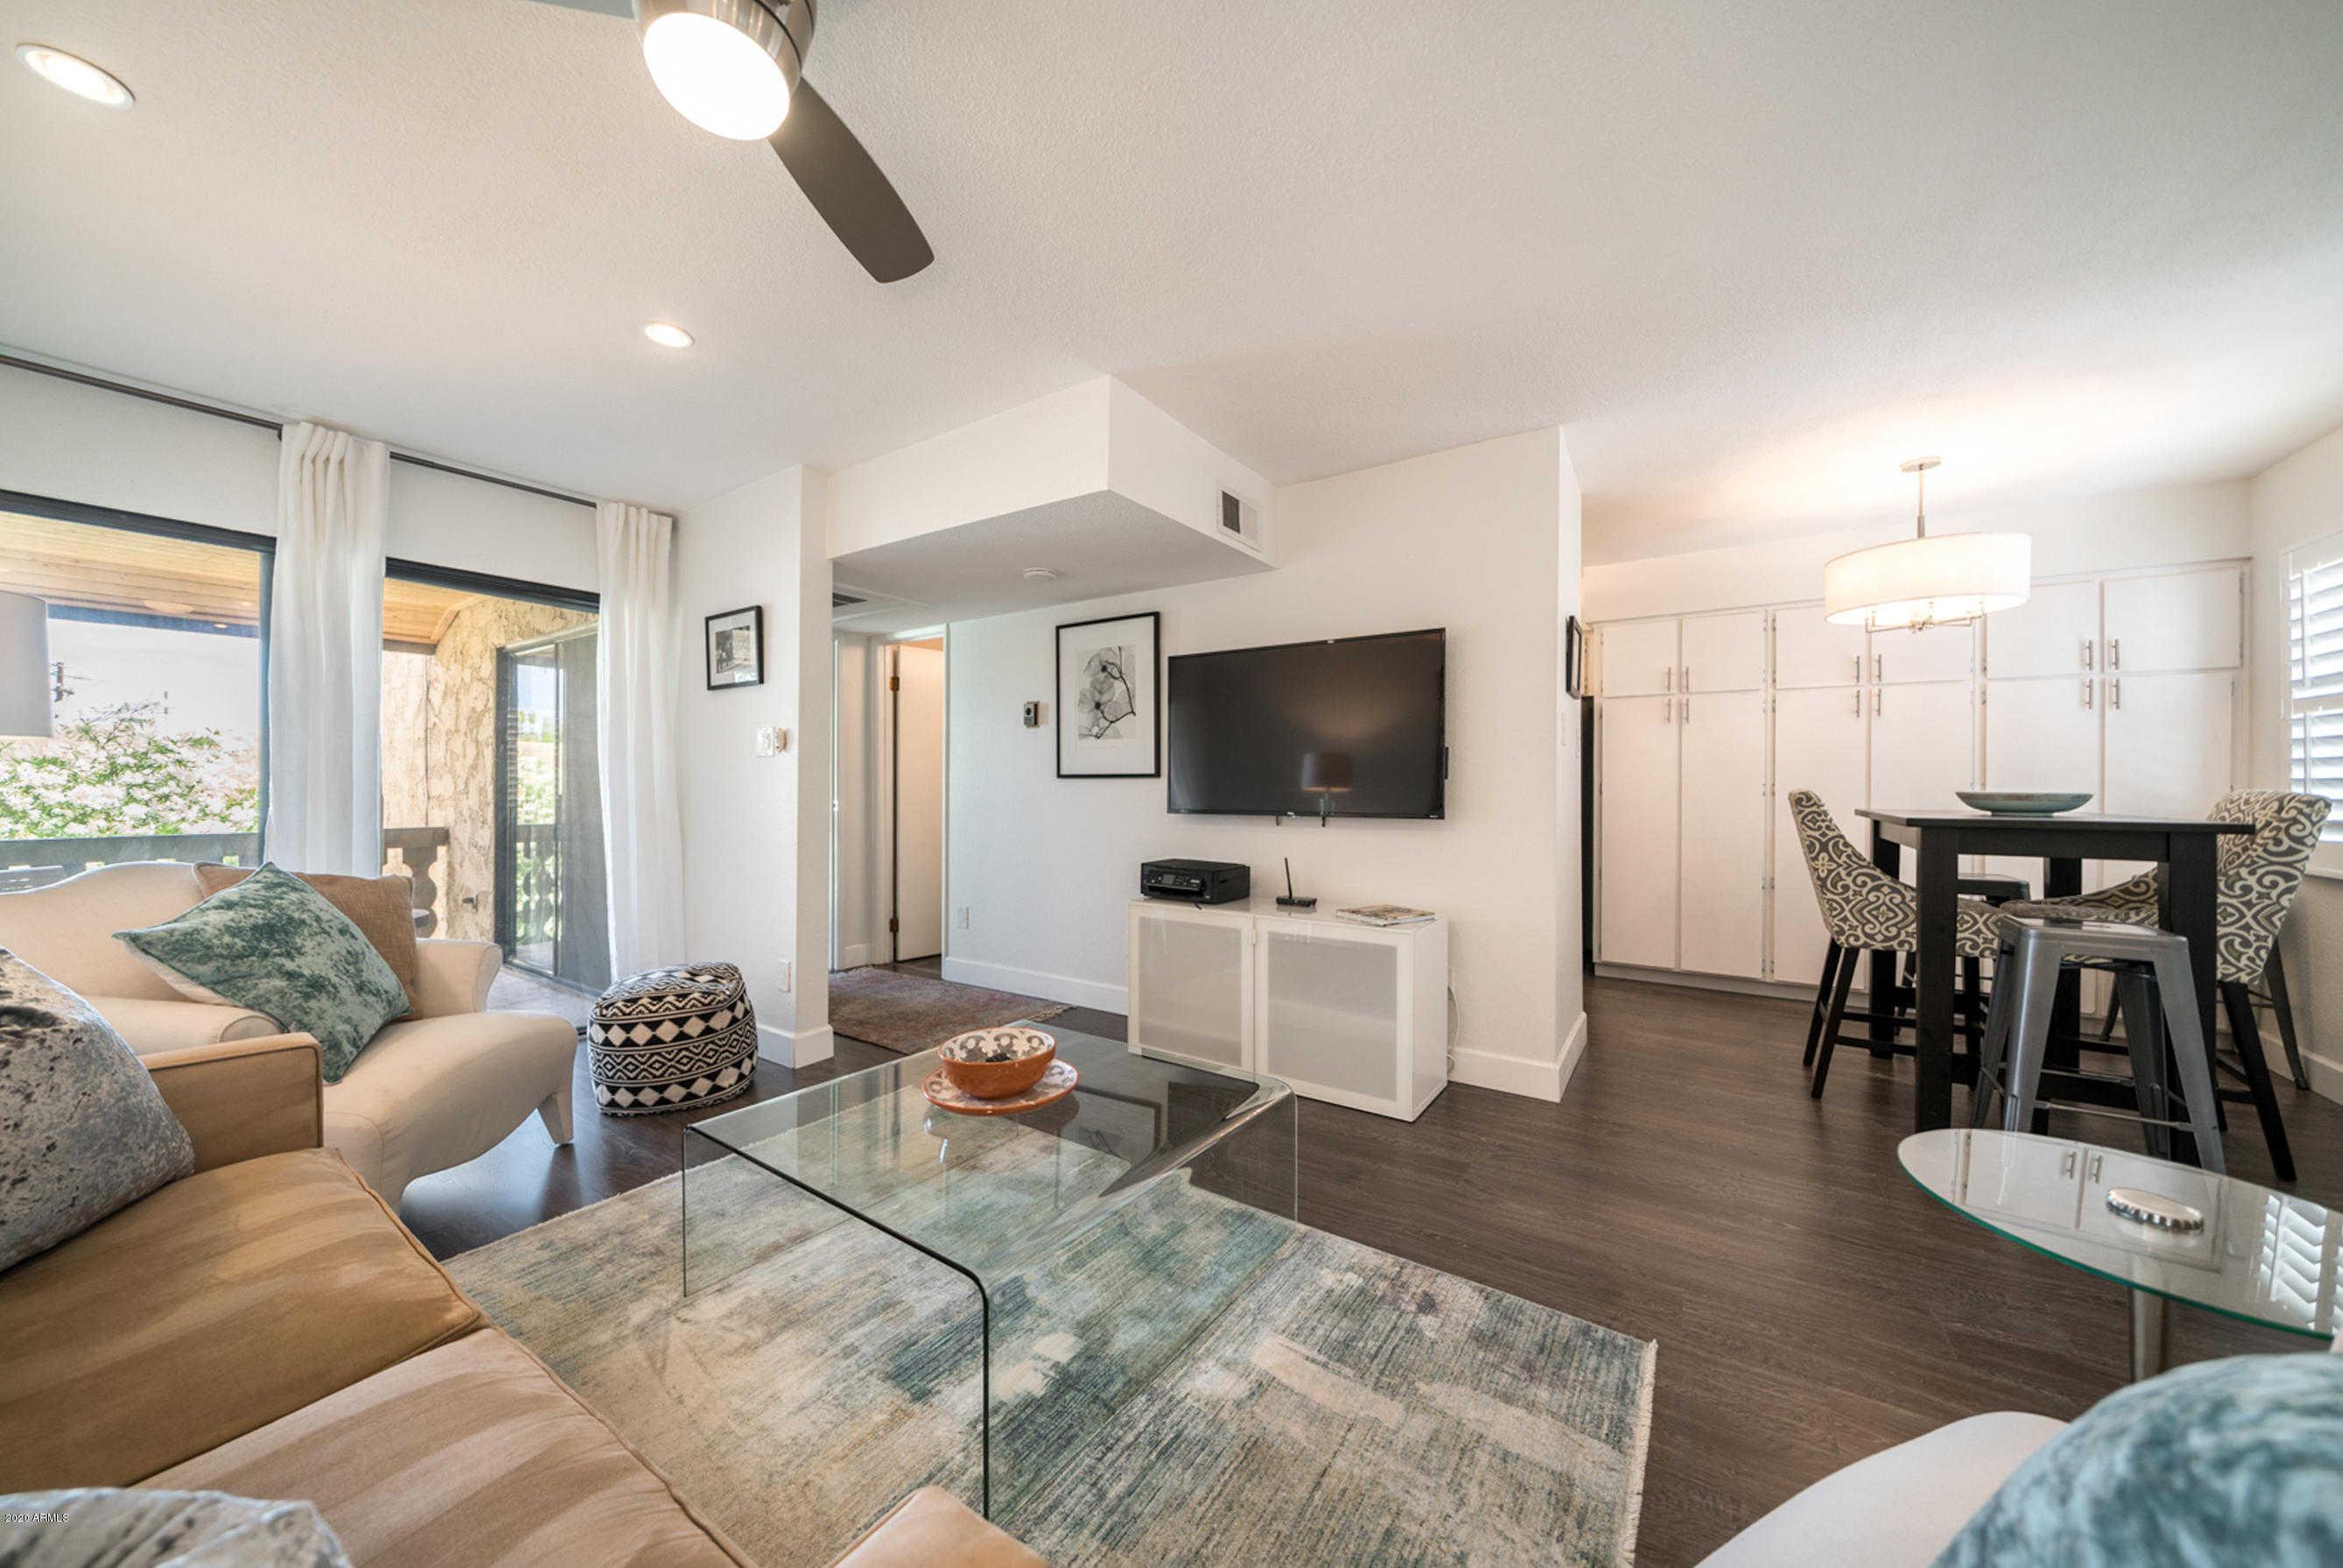 $175,000 - 1Br/1Ba -  for Sale in El Chaparral Villas, Scottsdale